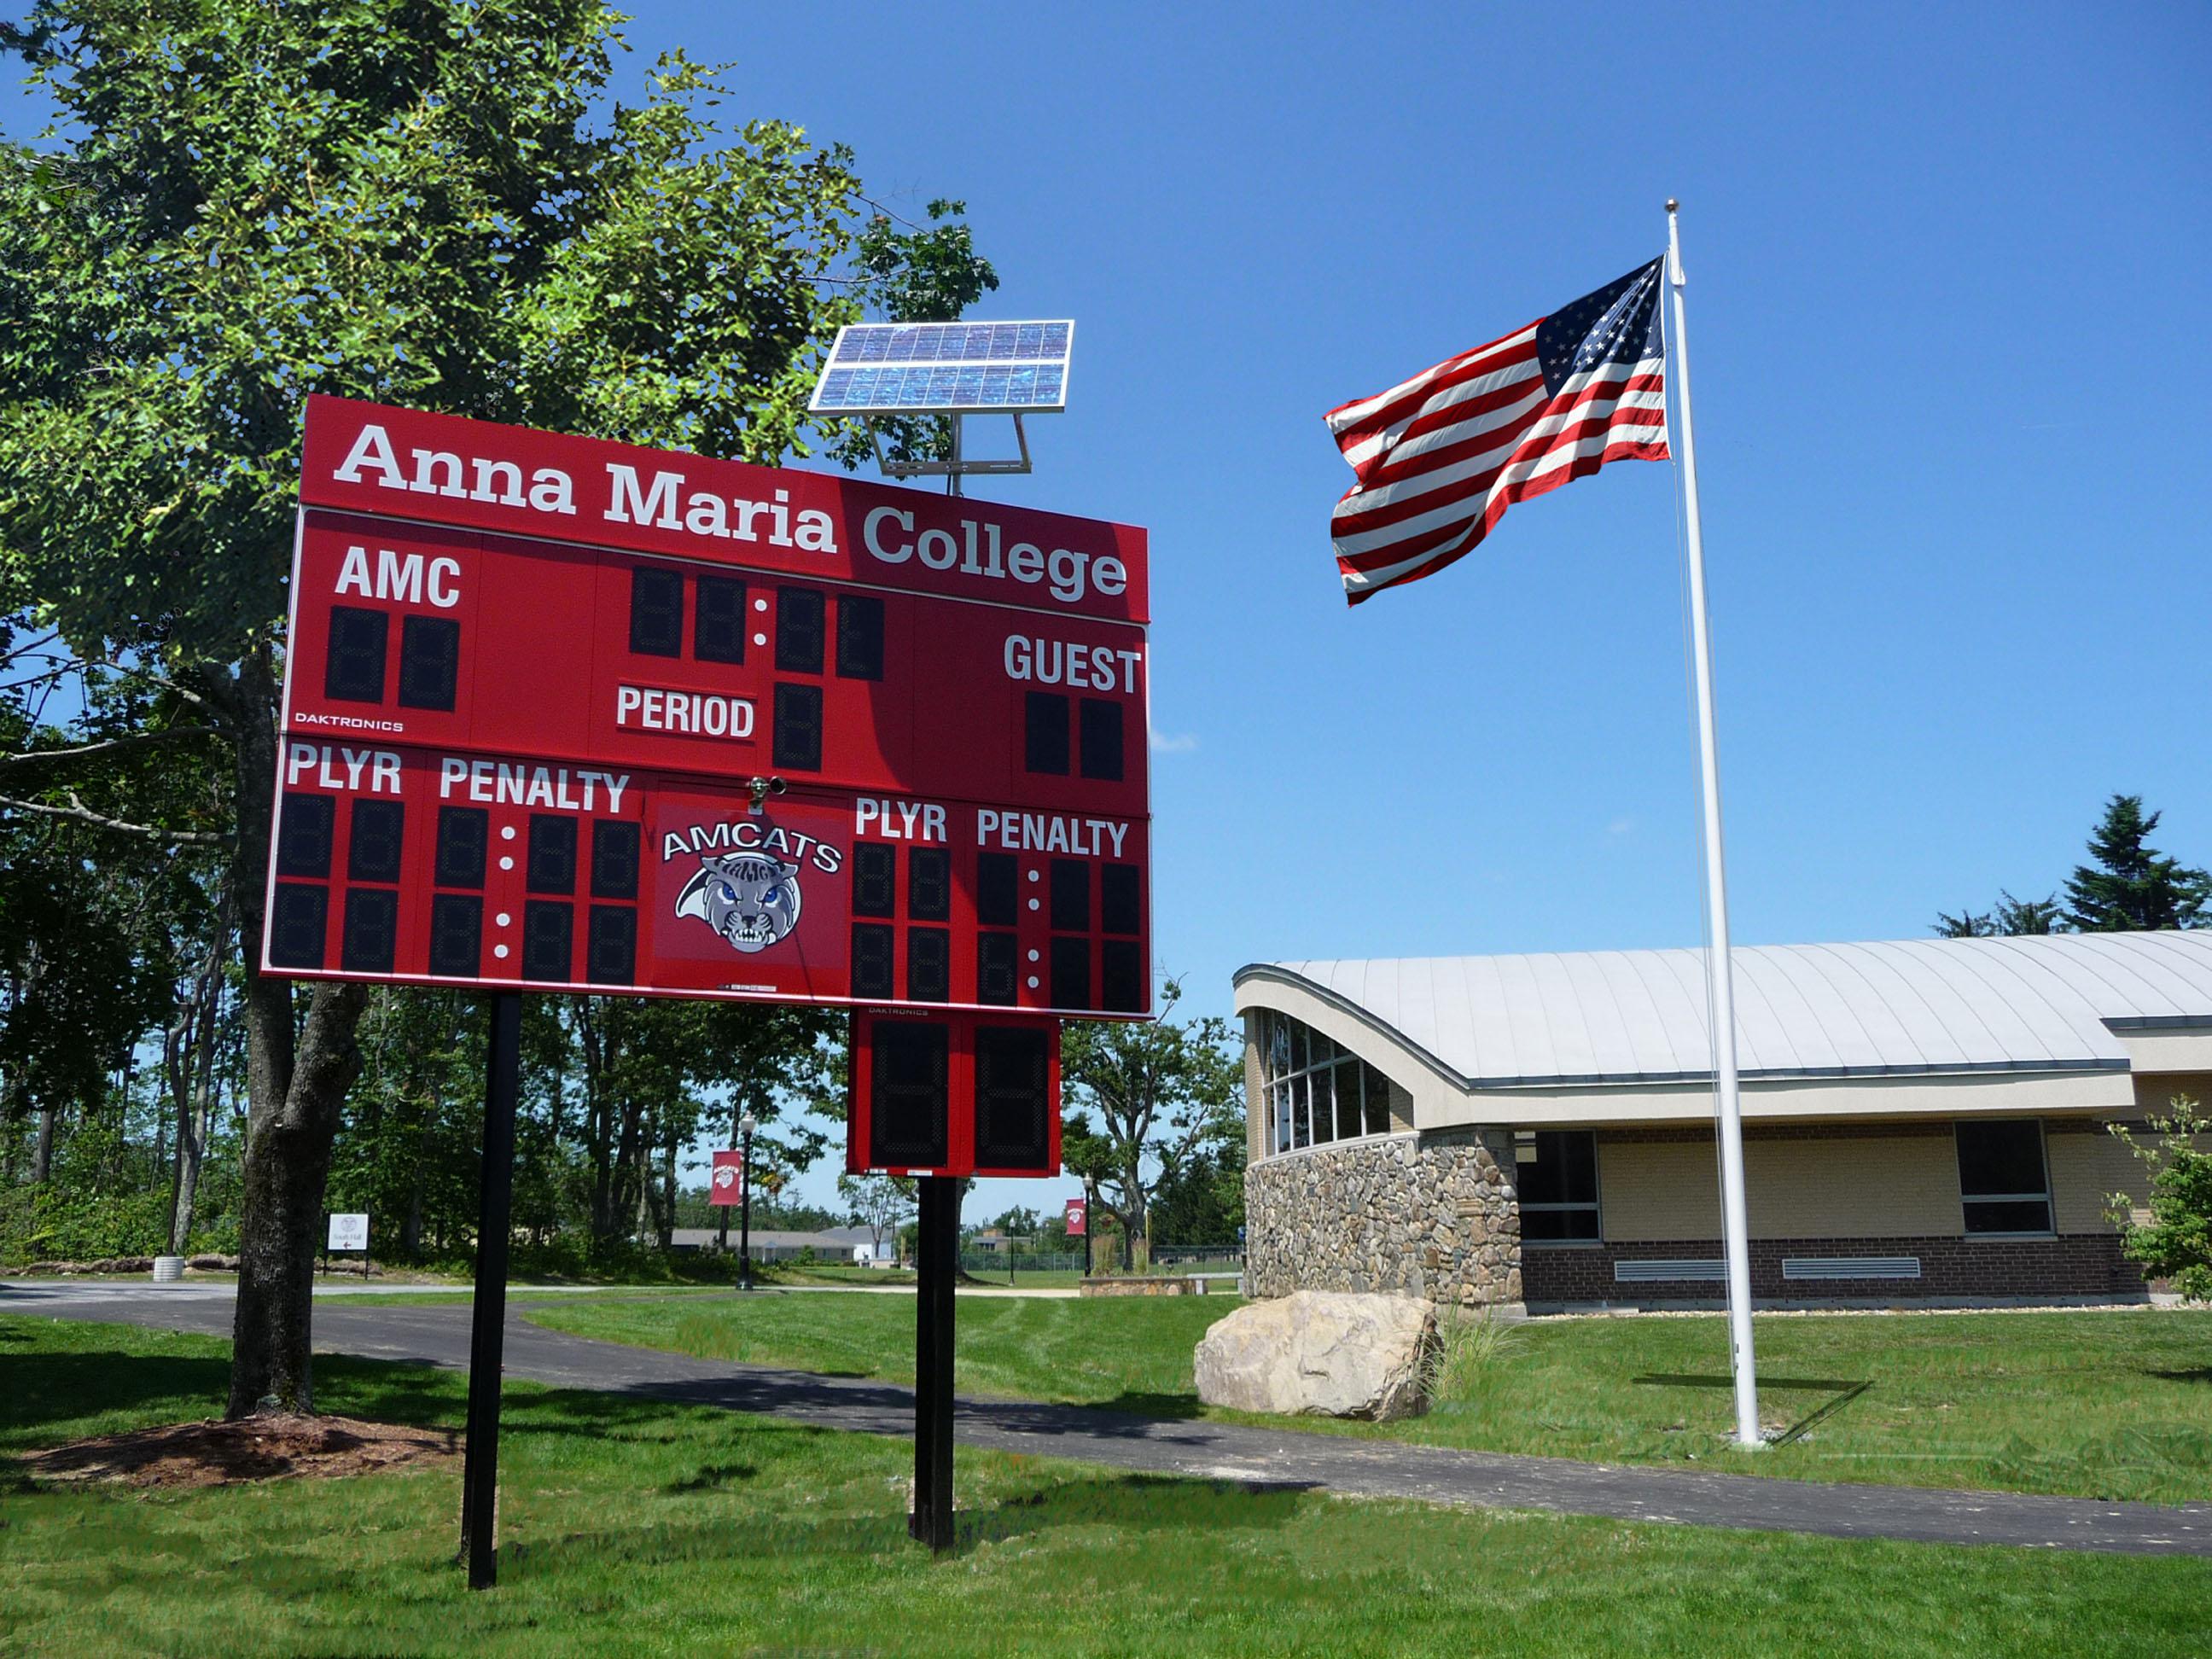 Anna Maria College